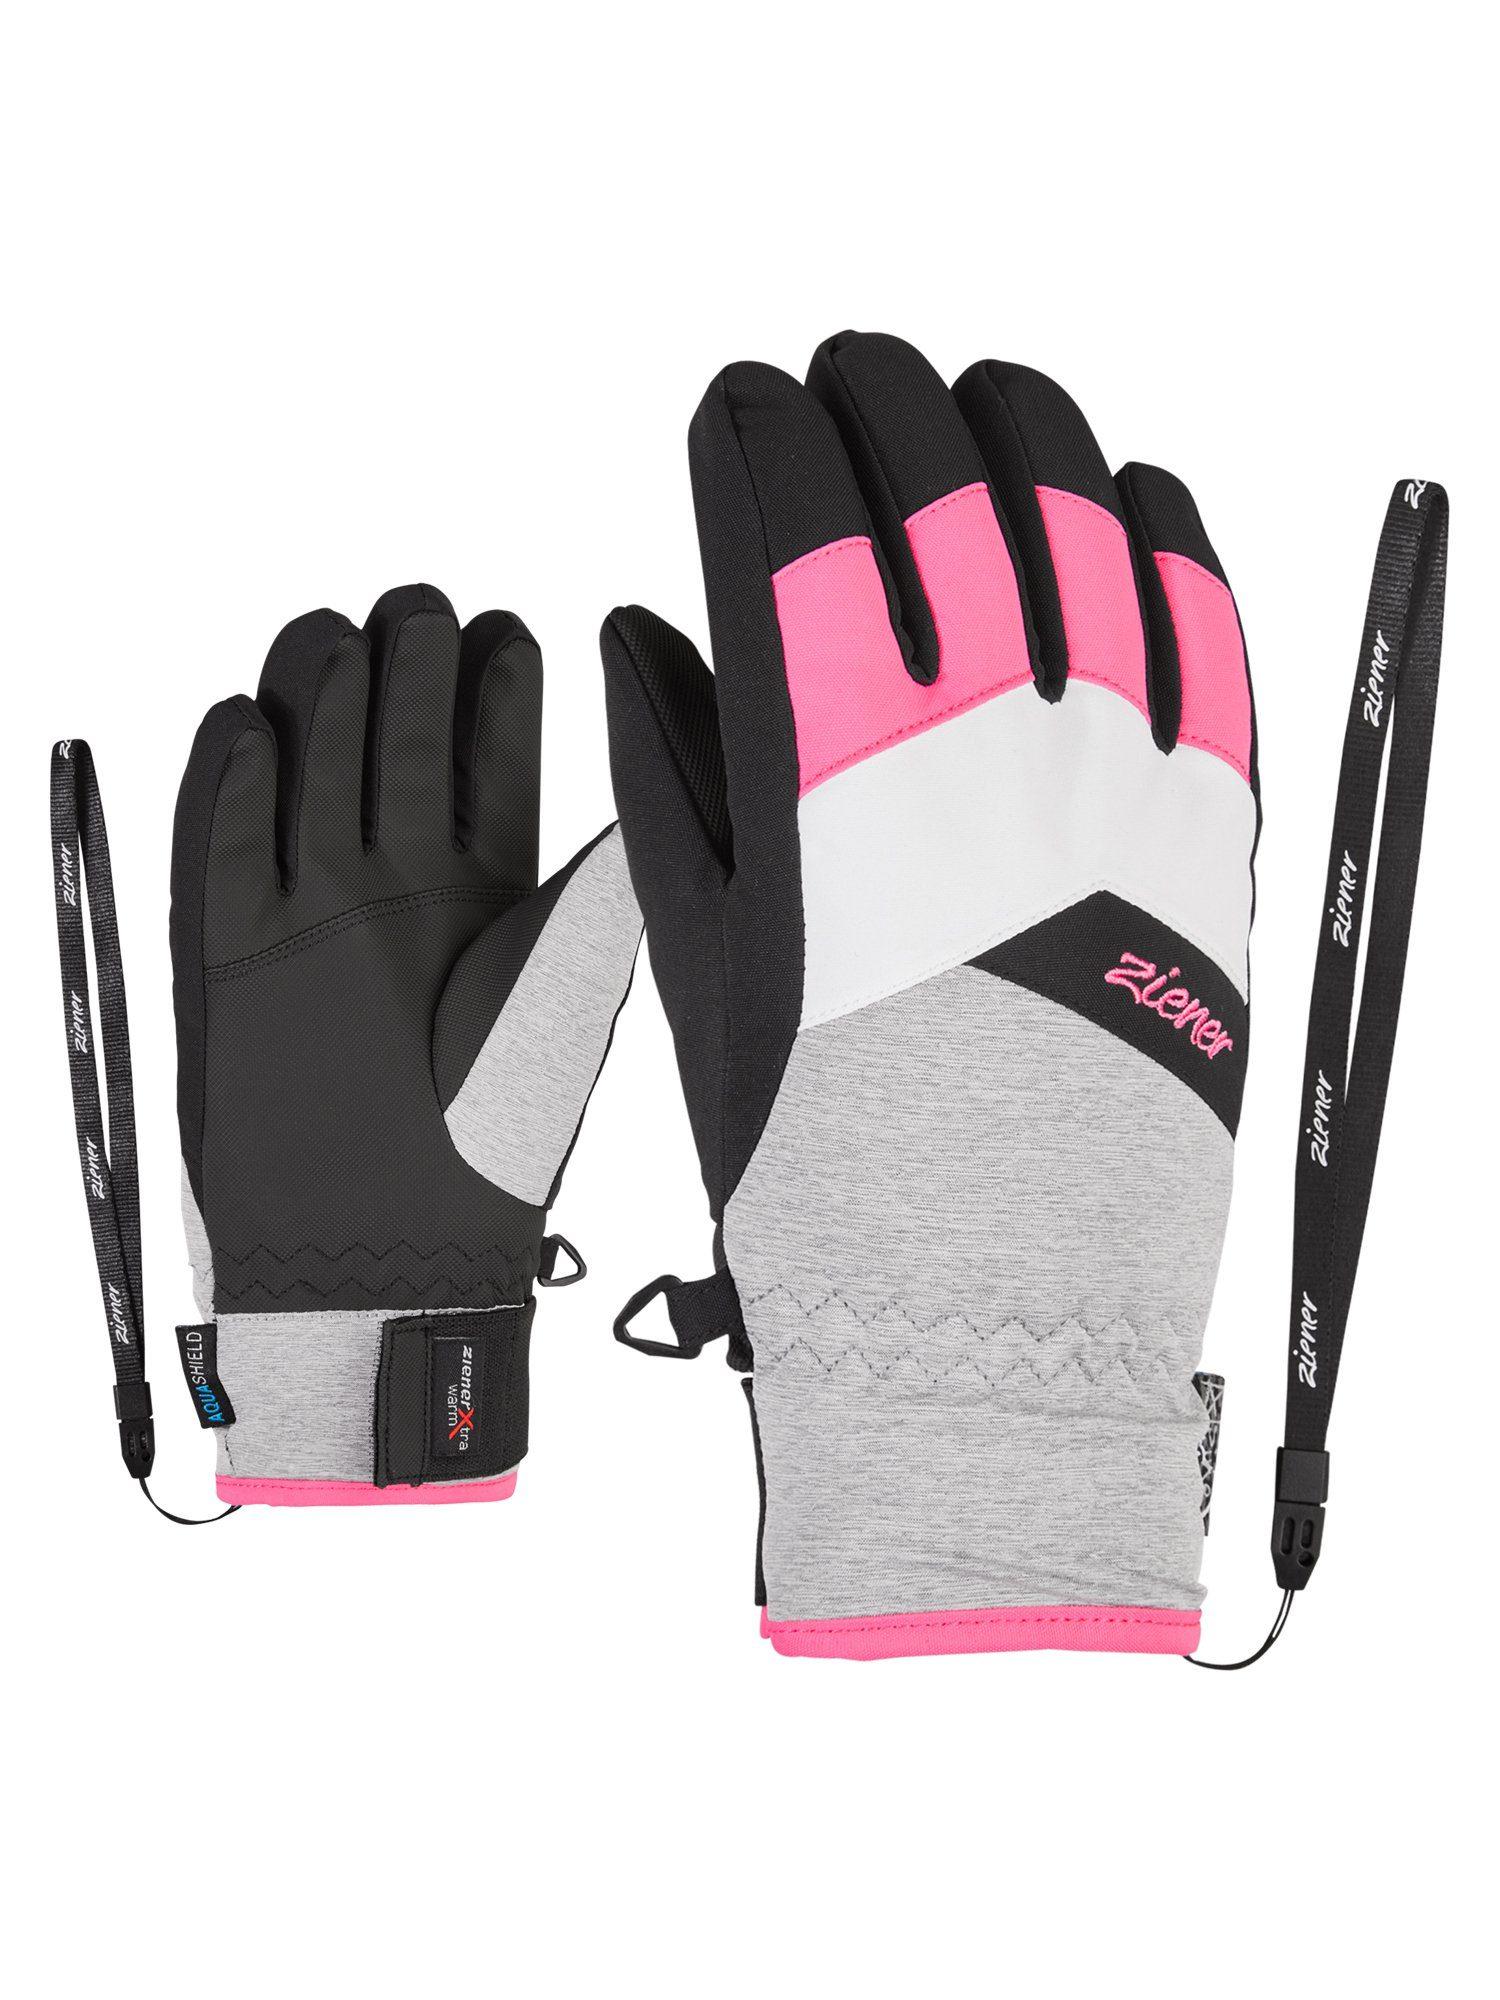 Ziener Kinder Ski Handschuh LARA GTX® GIRLS schwarz